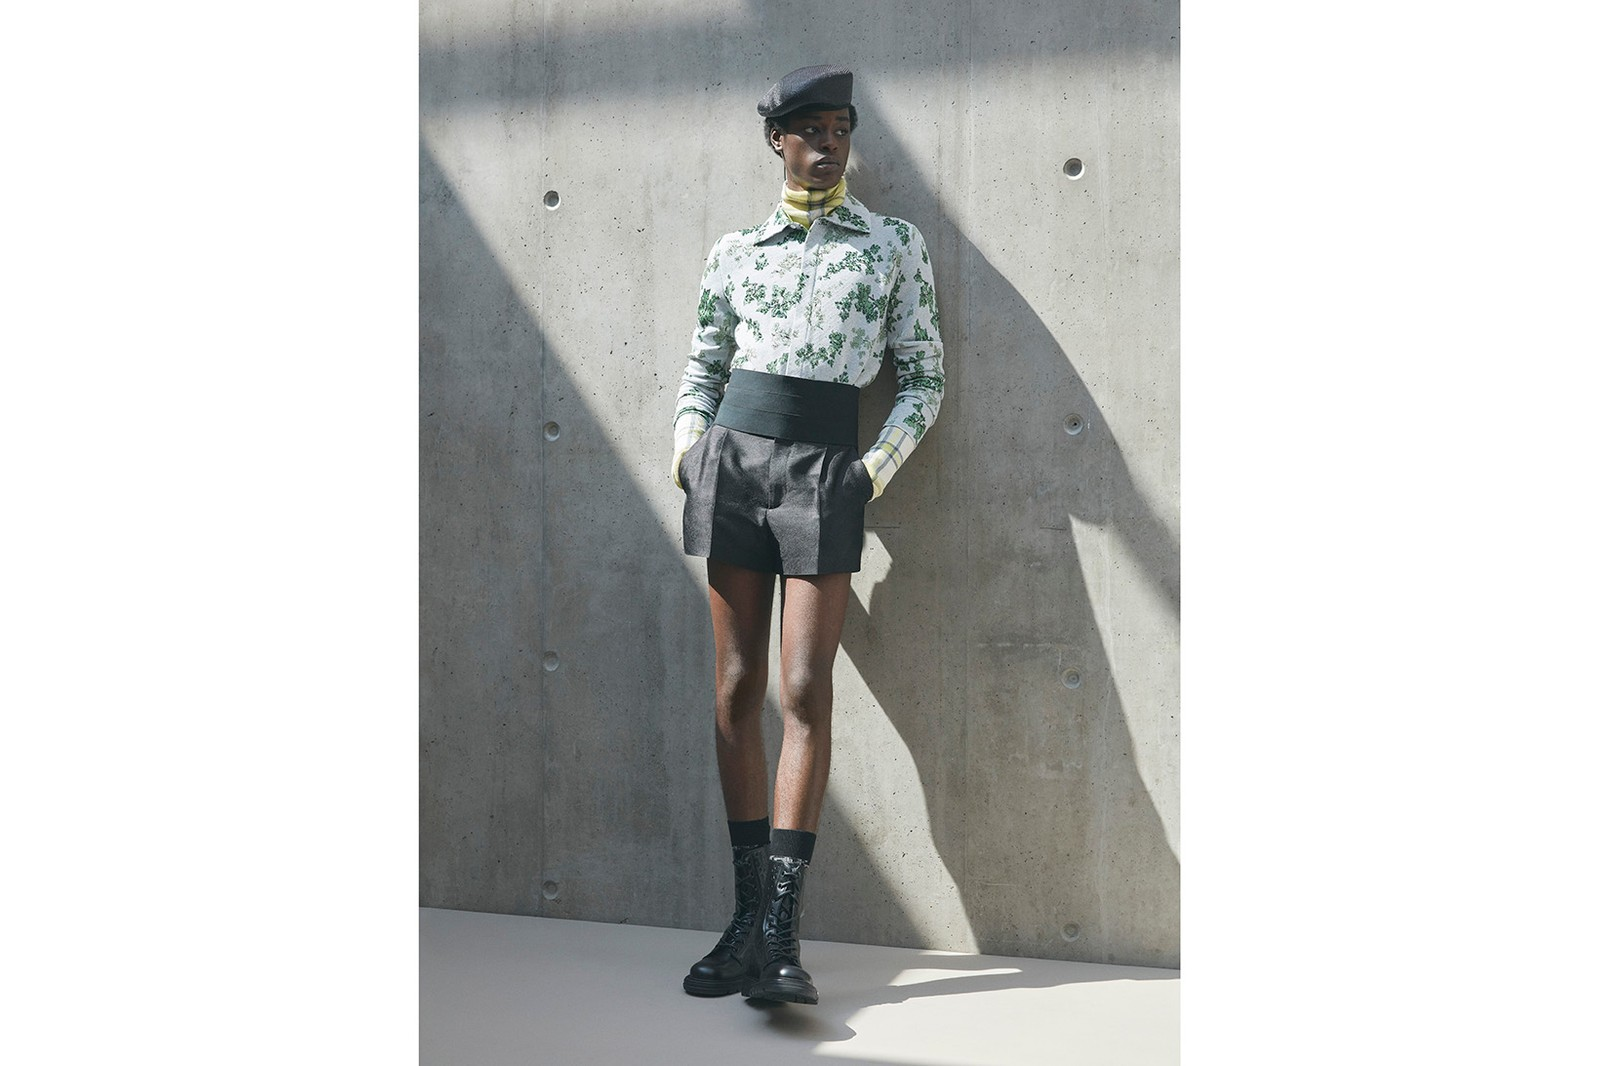 Dior Spring/Sumer 2021 Men's Collection Kim Jones Amoako Boafo Collaboration Lookbook Paris Fashion Week